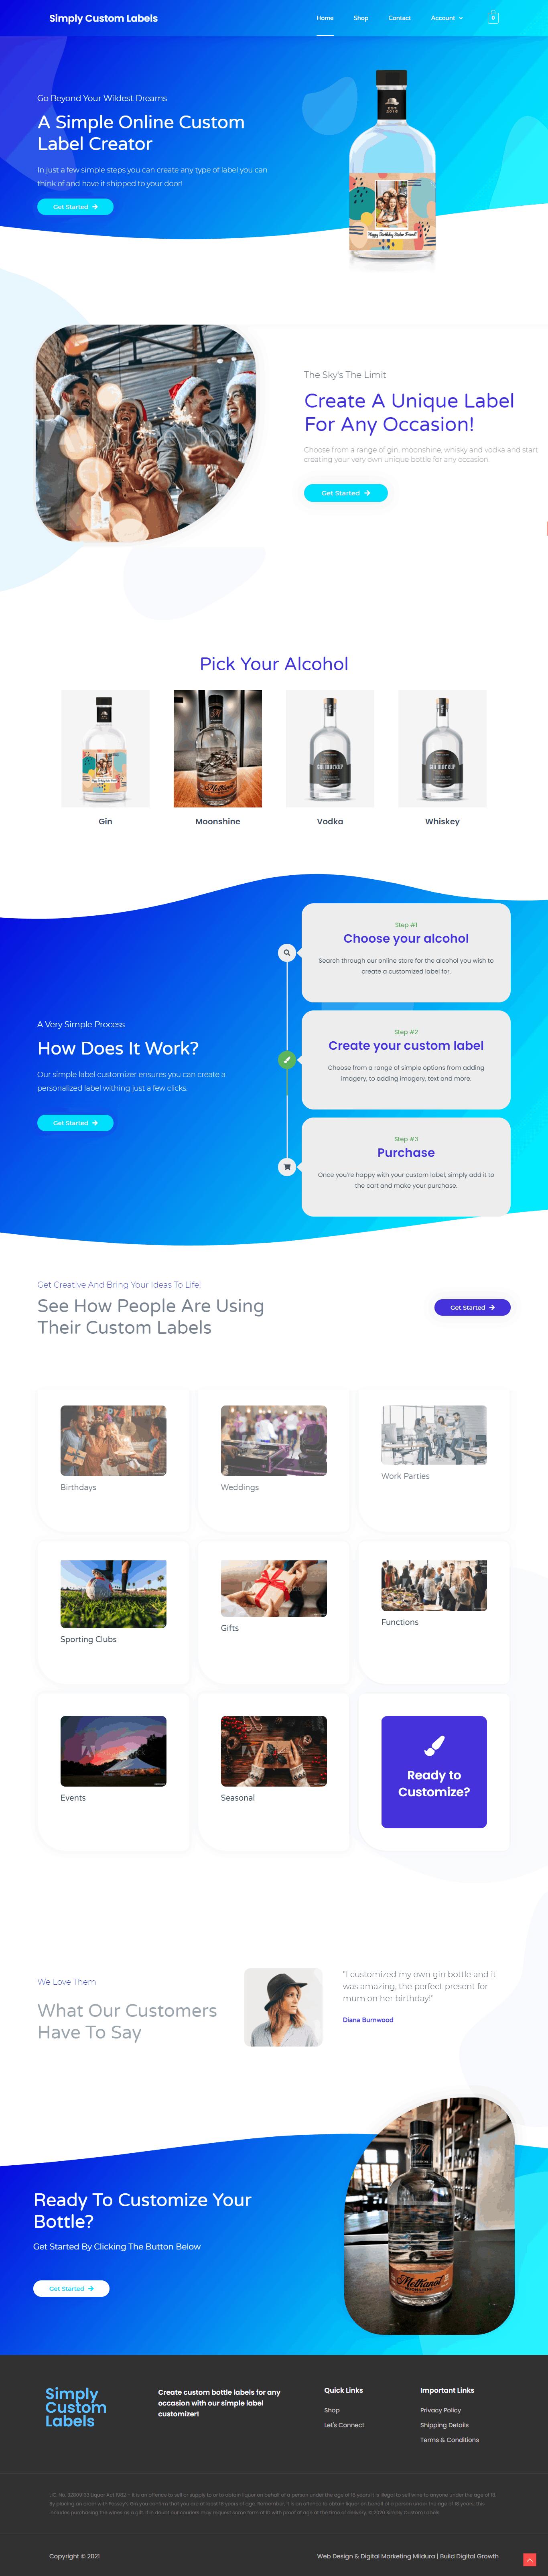 Simply Custom Labels Web Design